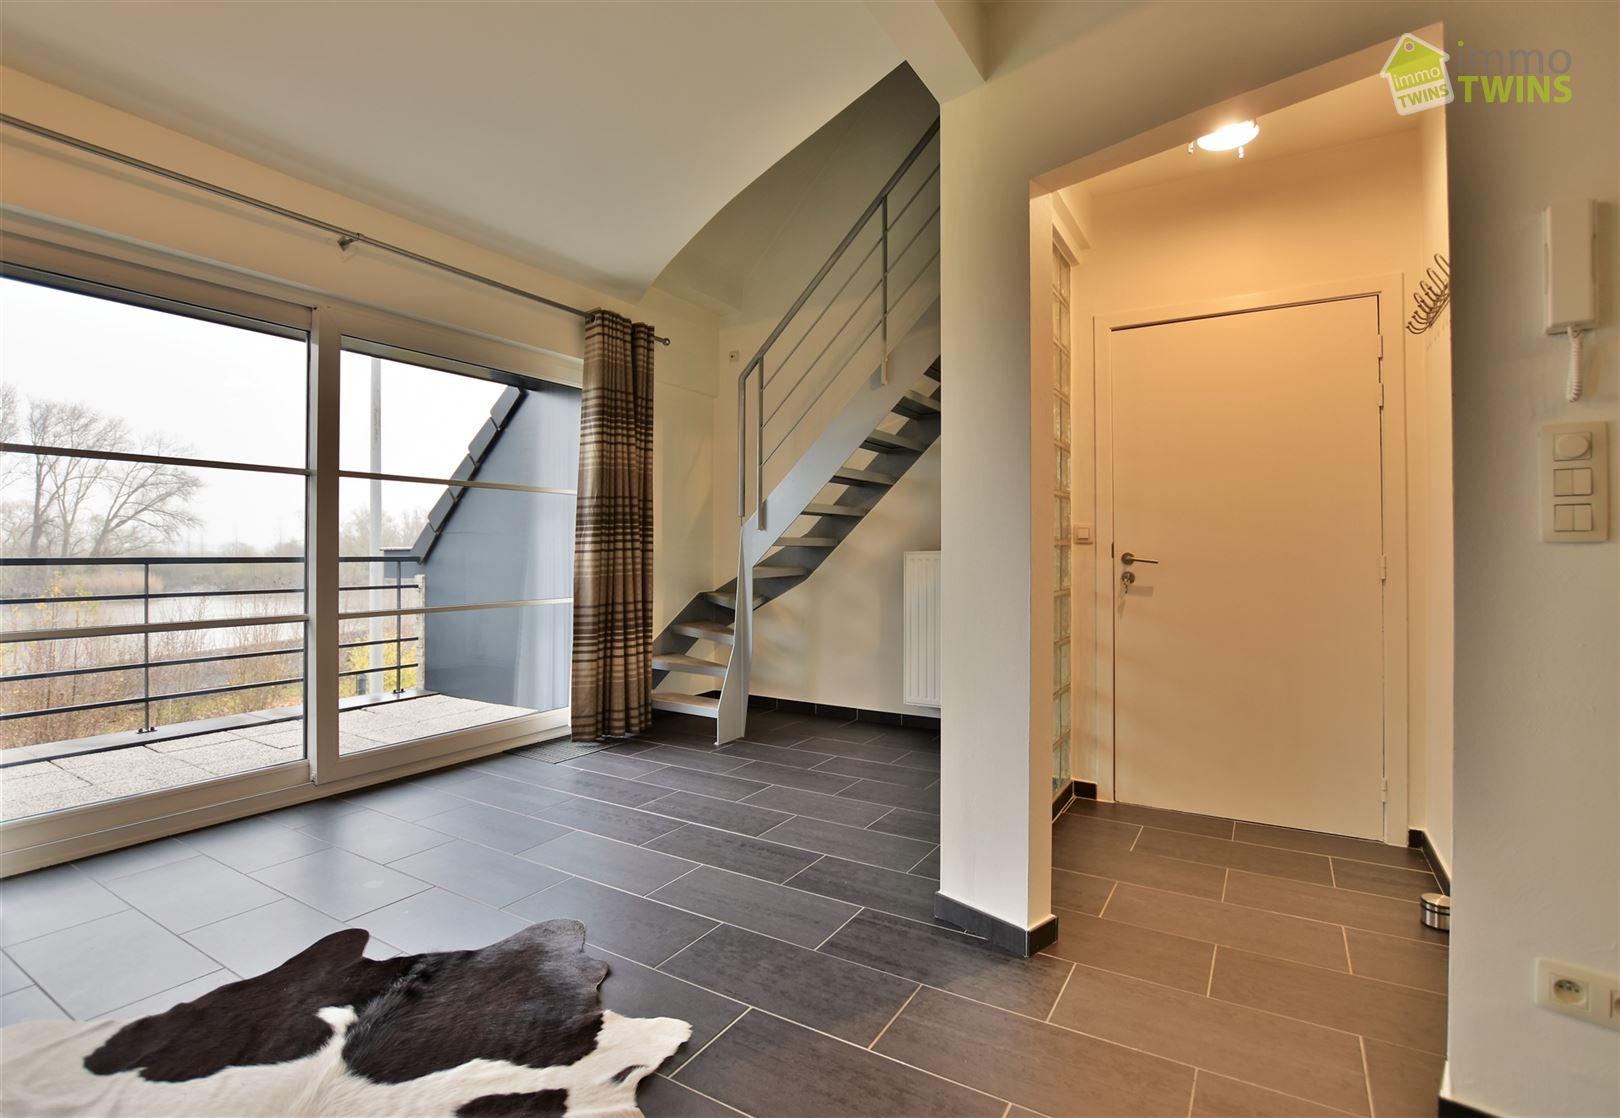 Foto 2 : Appartement te 9200 BAASRODE (België) - Prijs € 650